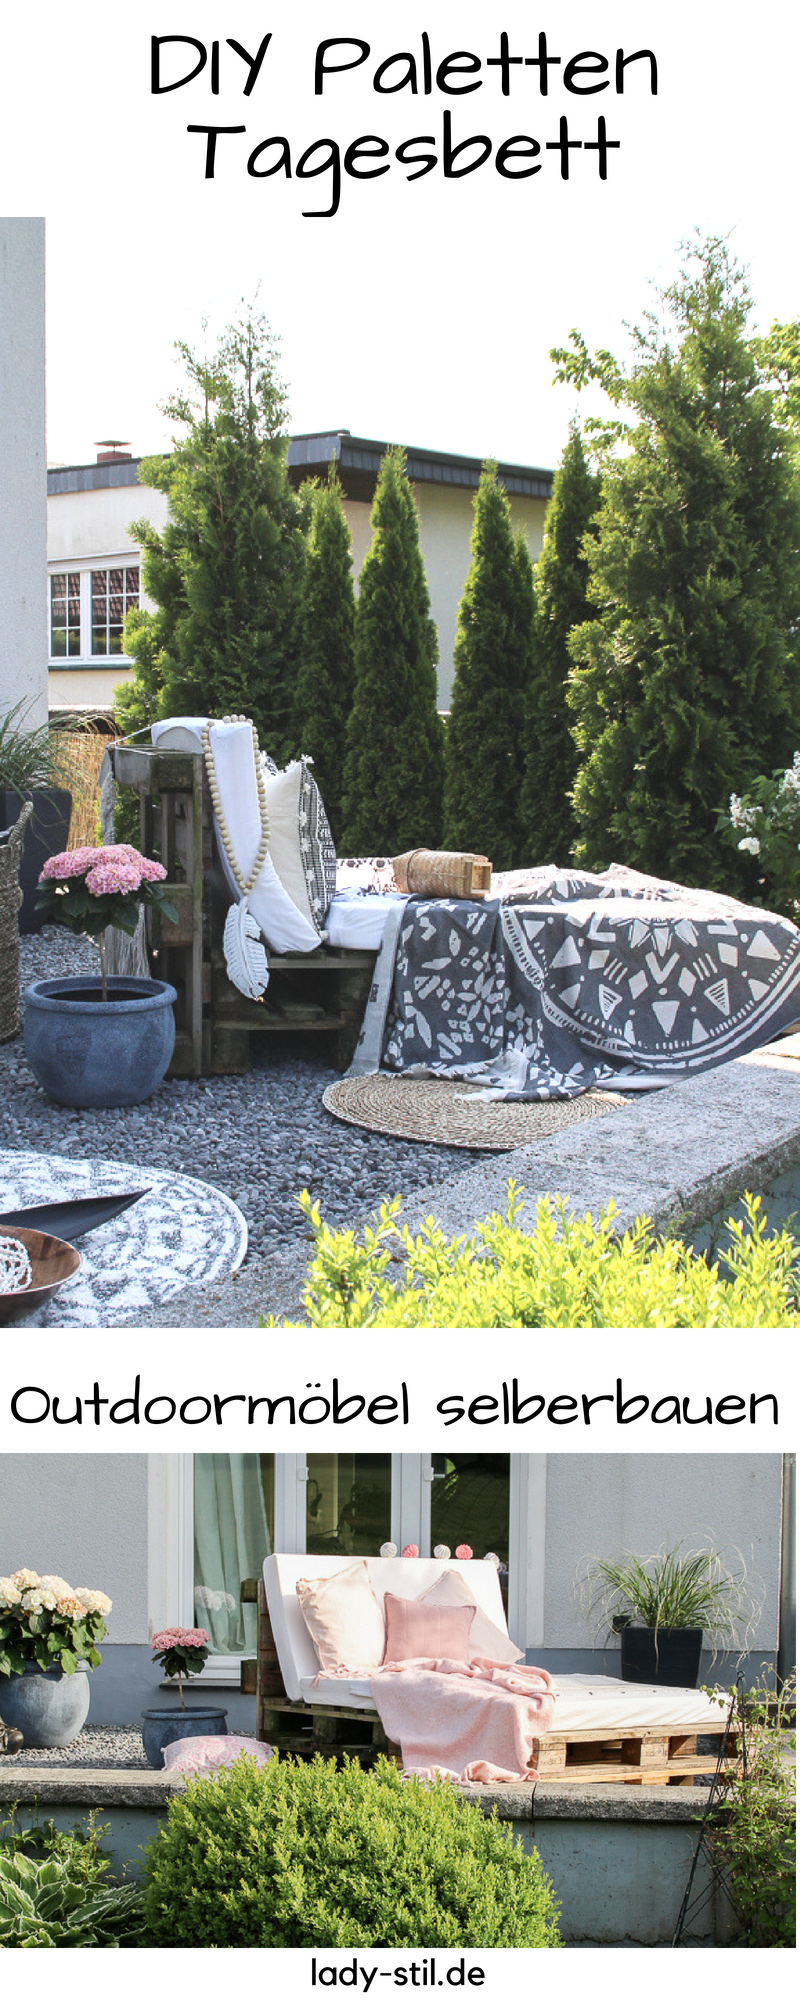 DIY Paletten Tagesbett